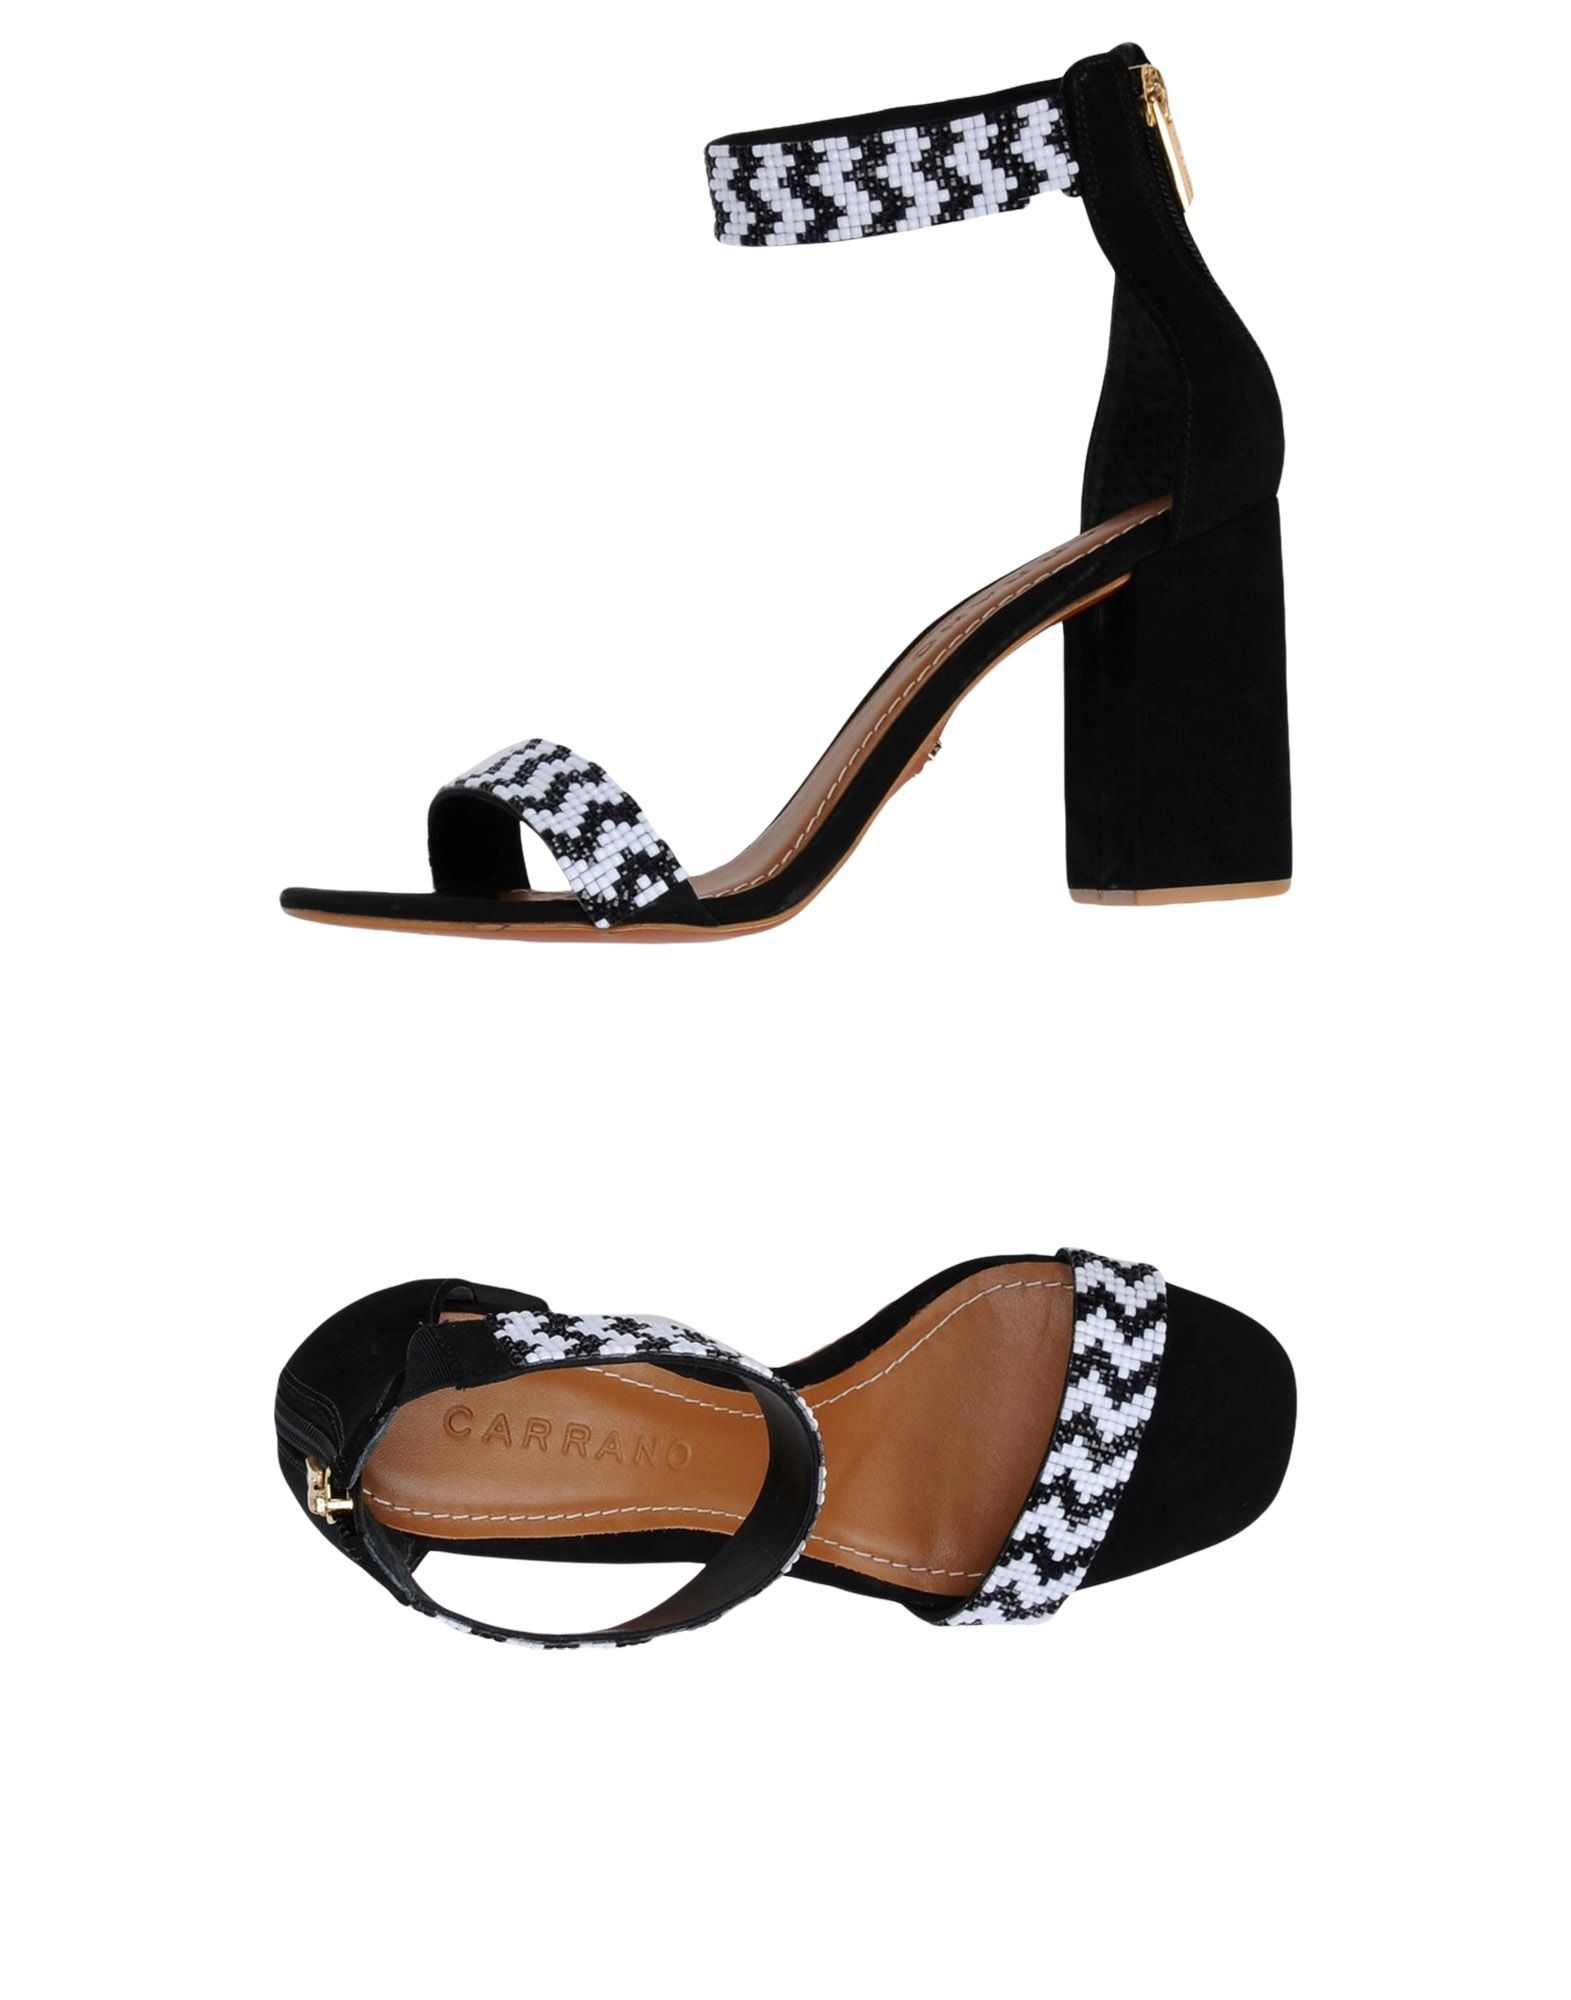 Stilvolle Damen billige Schuhe Carrano Sandalen Damen Stilvolle  11268619OE 513592